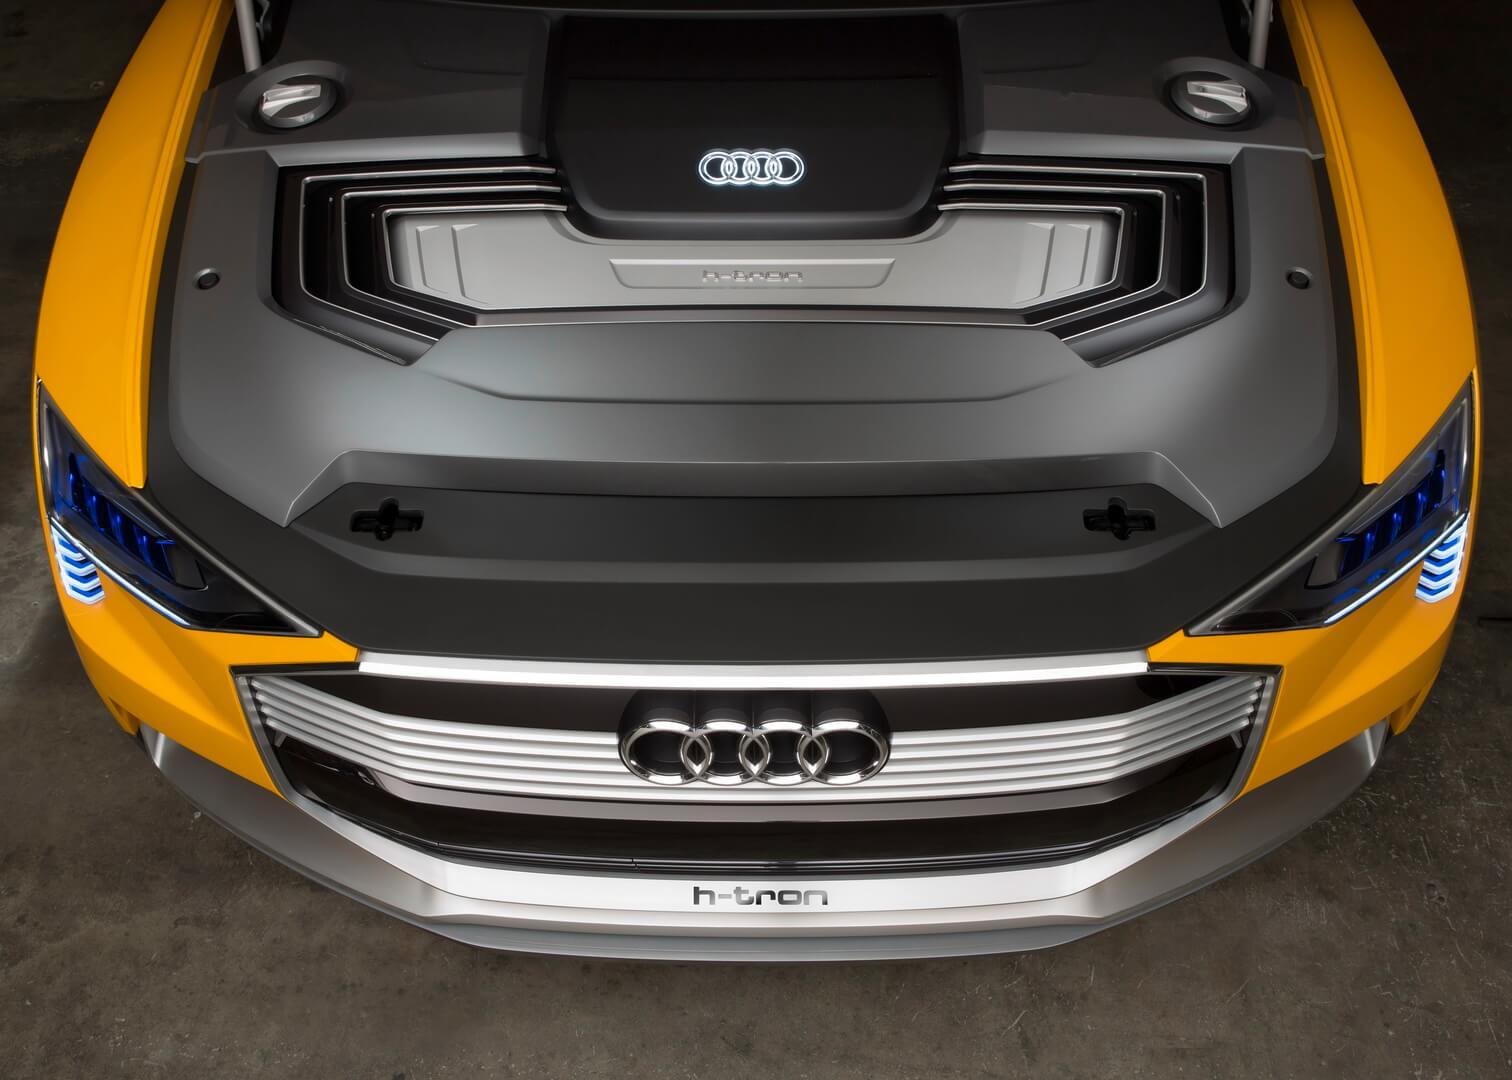 Концепт Audi h-tron quattro FCEV